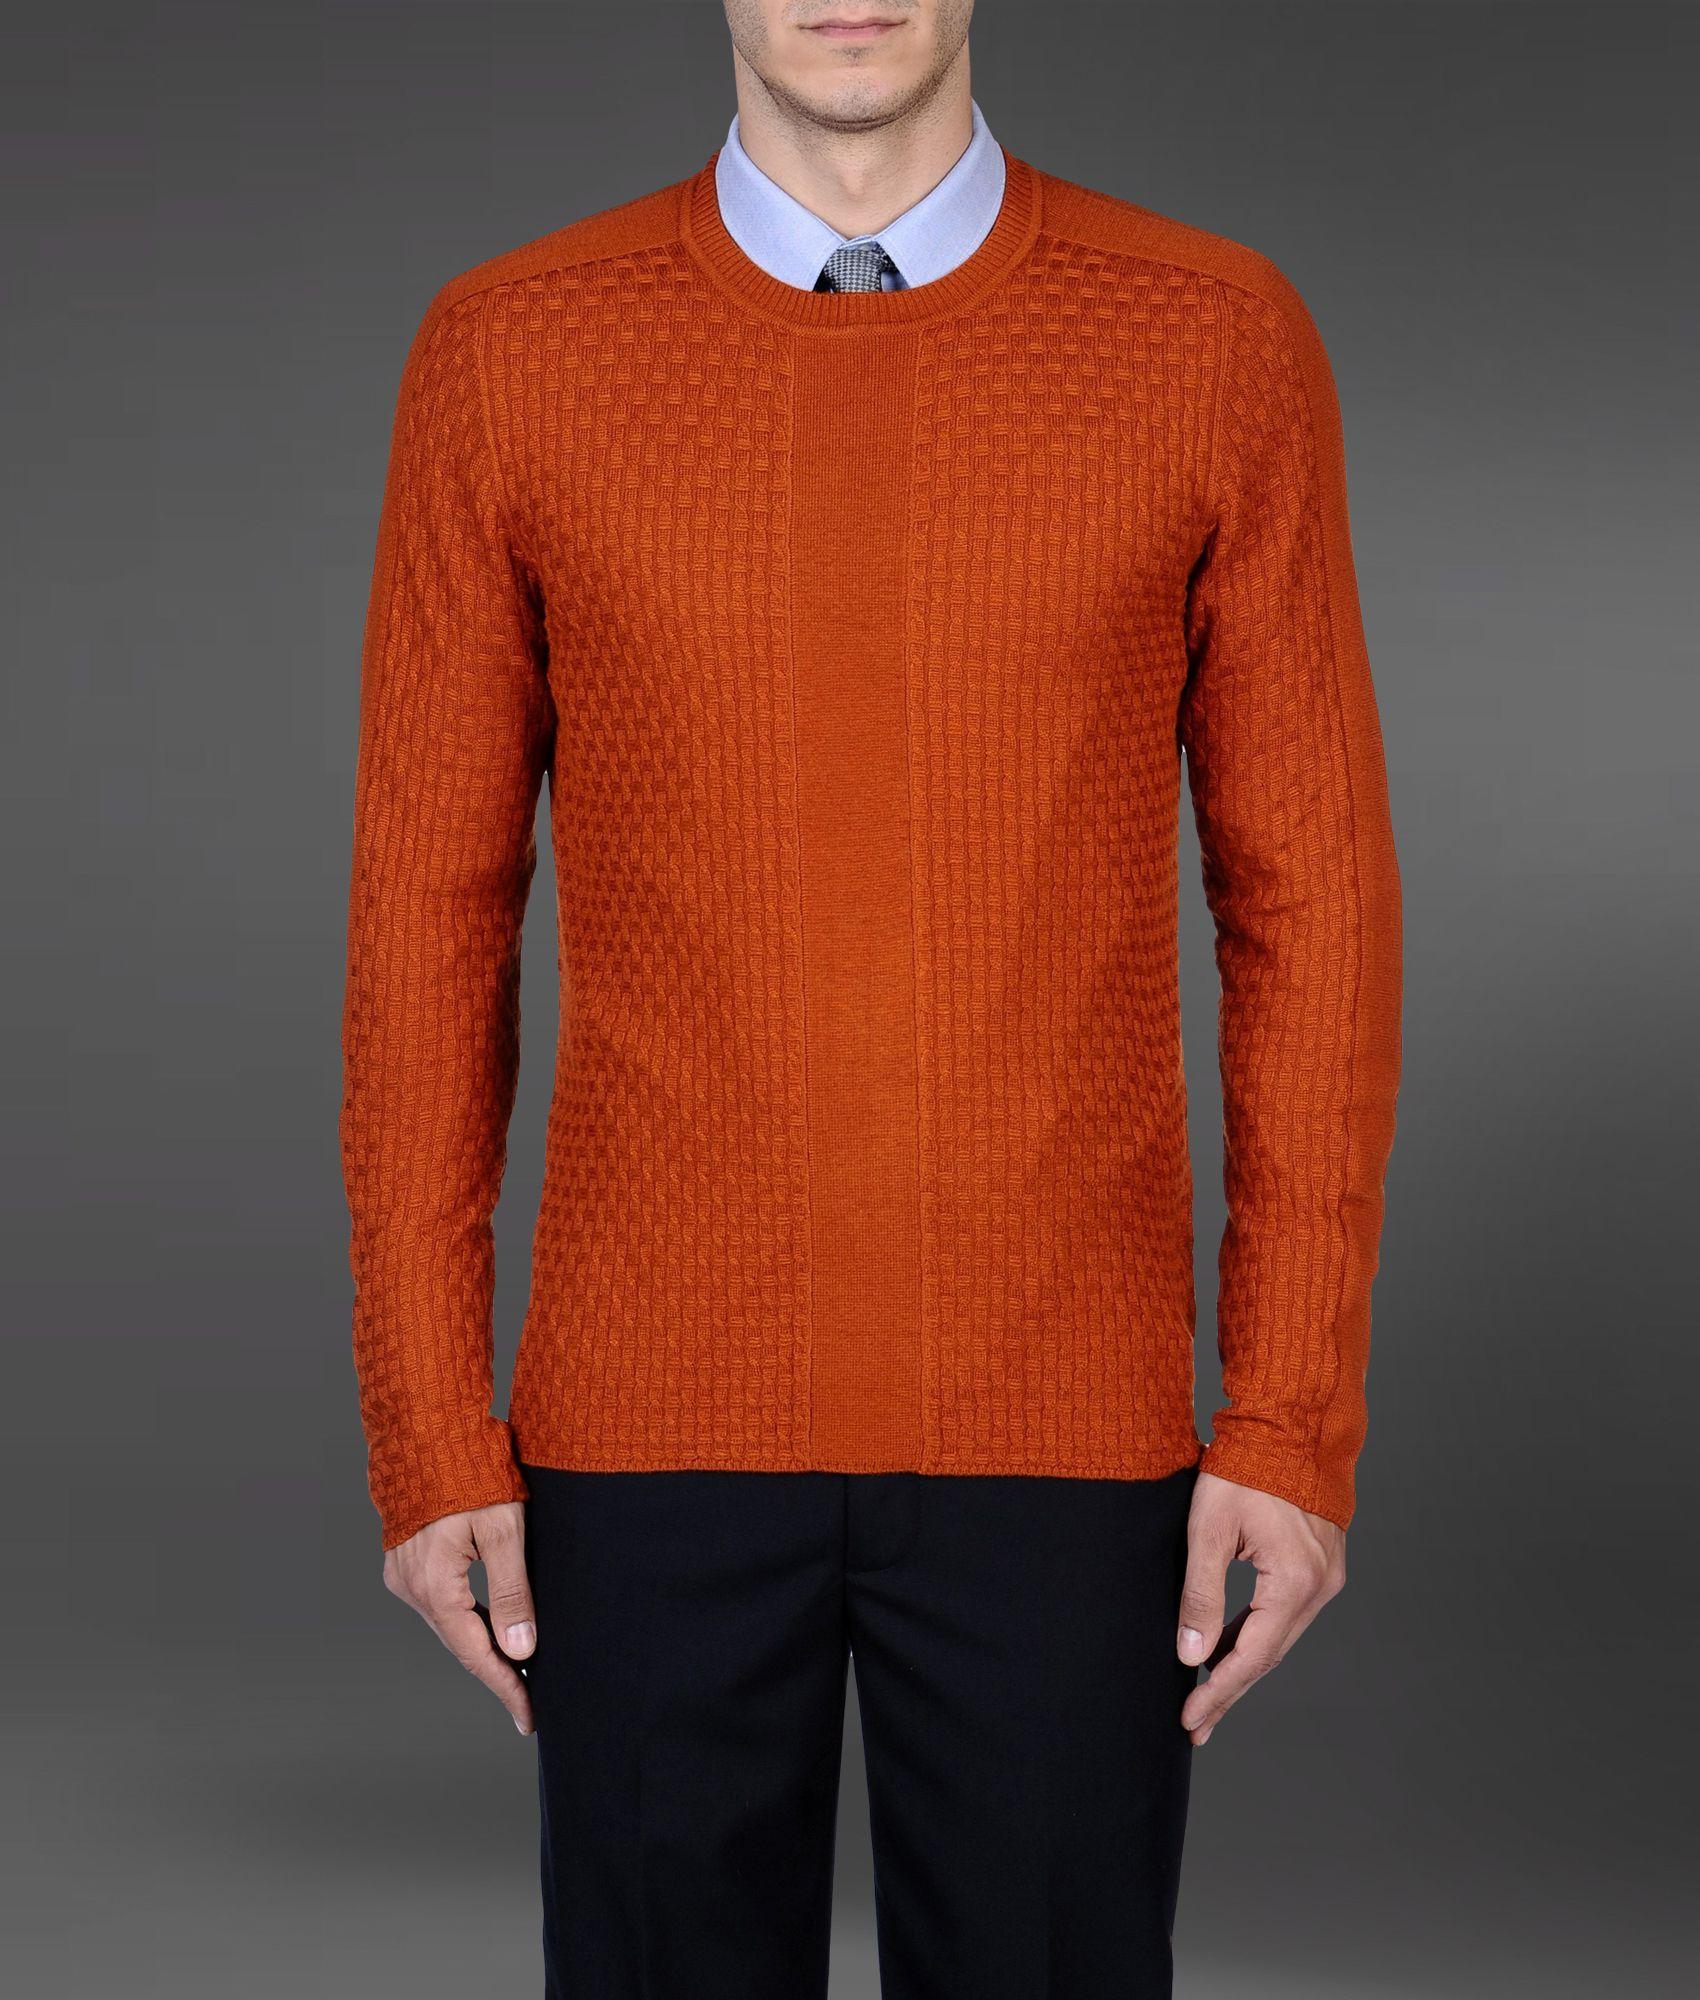 lyst emporio armani sweater in orange for men. Black Bedroom Furniture Sets. Home Design Ideas